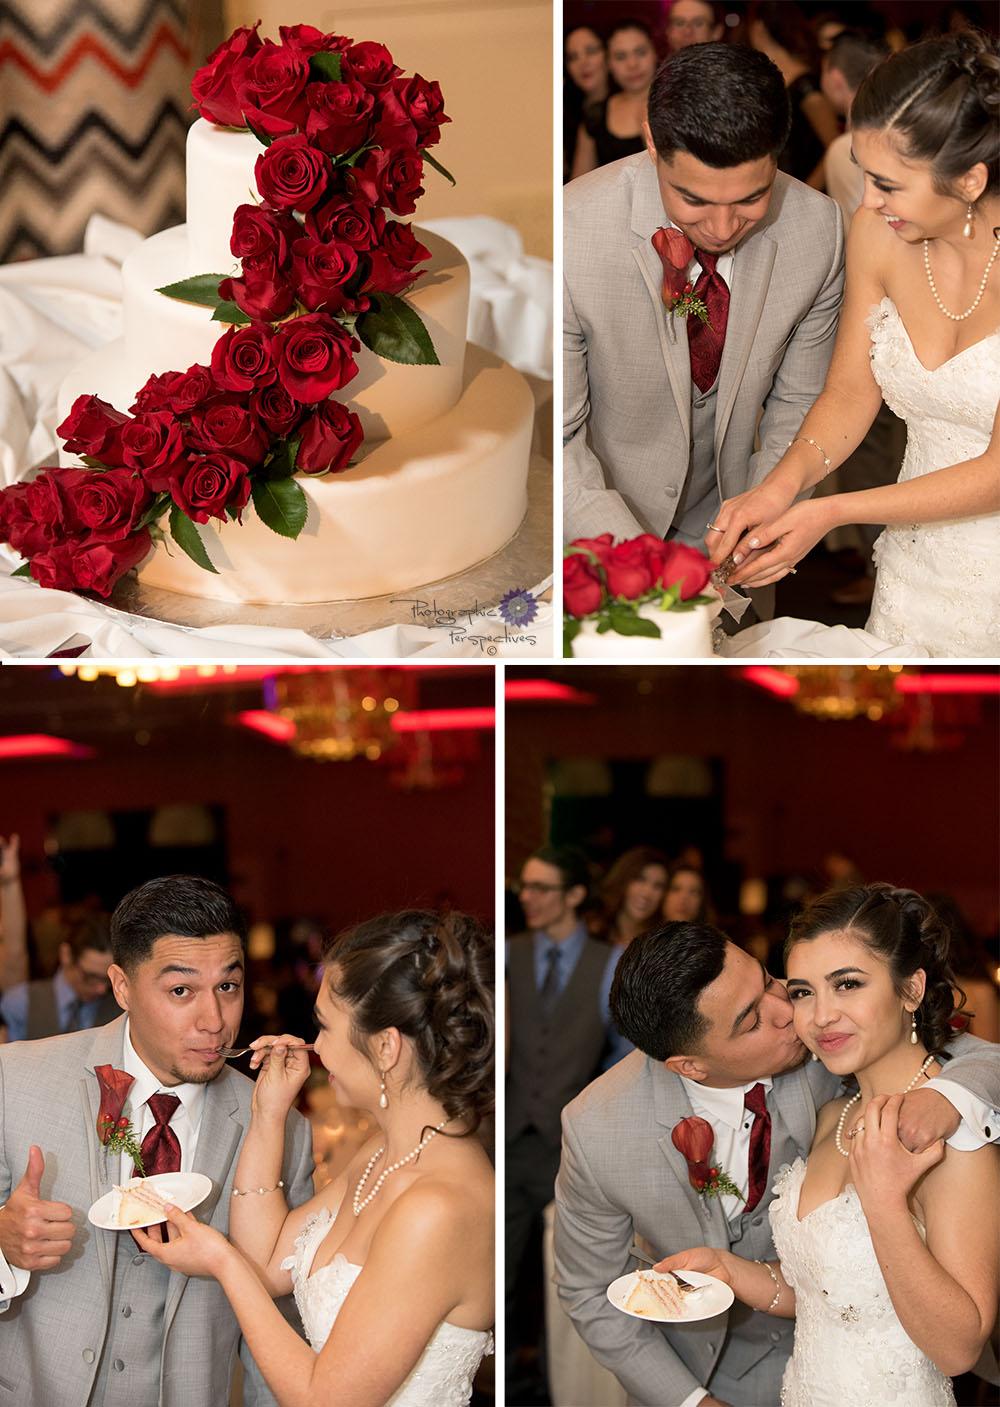 Eldorado Hotel Wedding -cake cutting